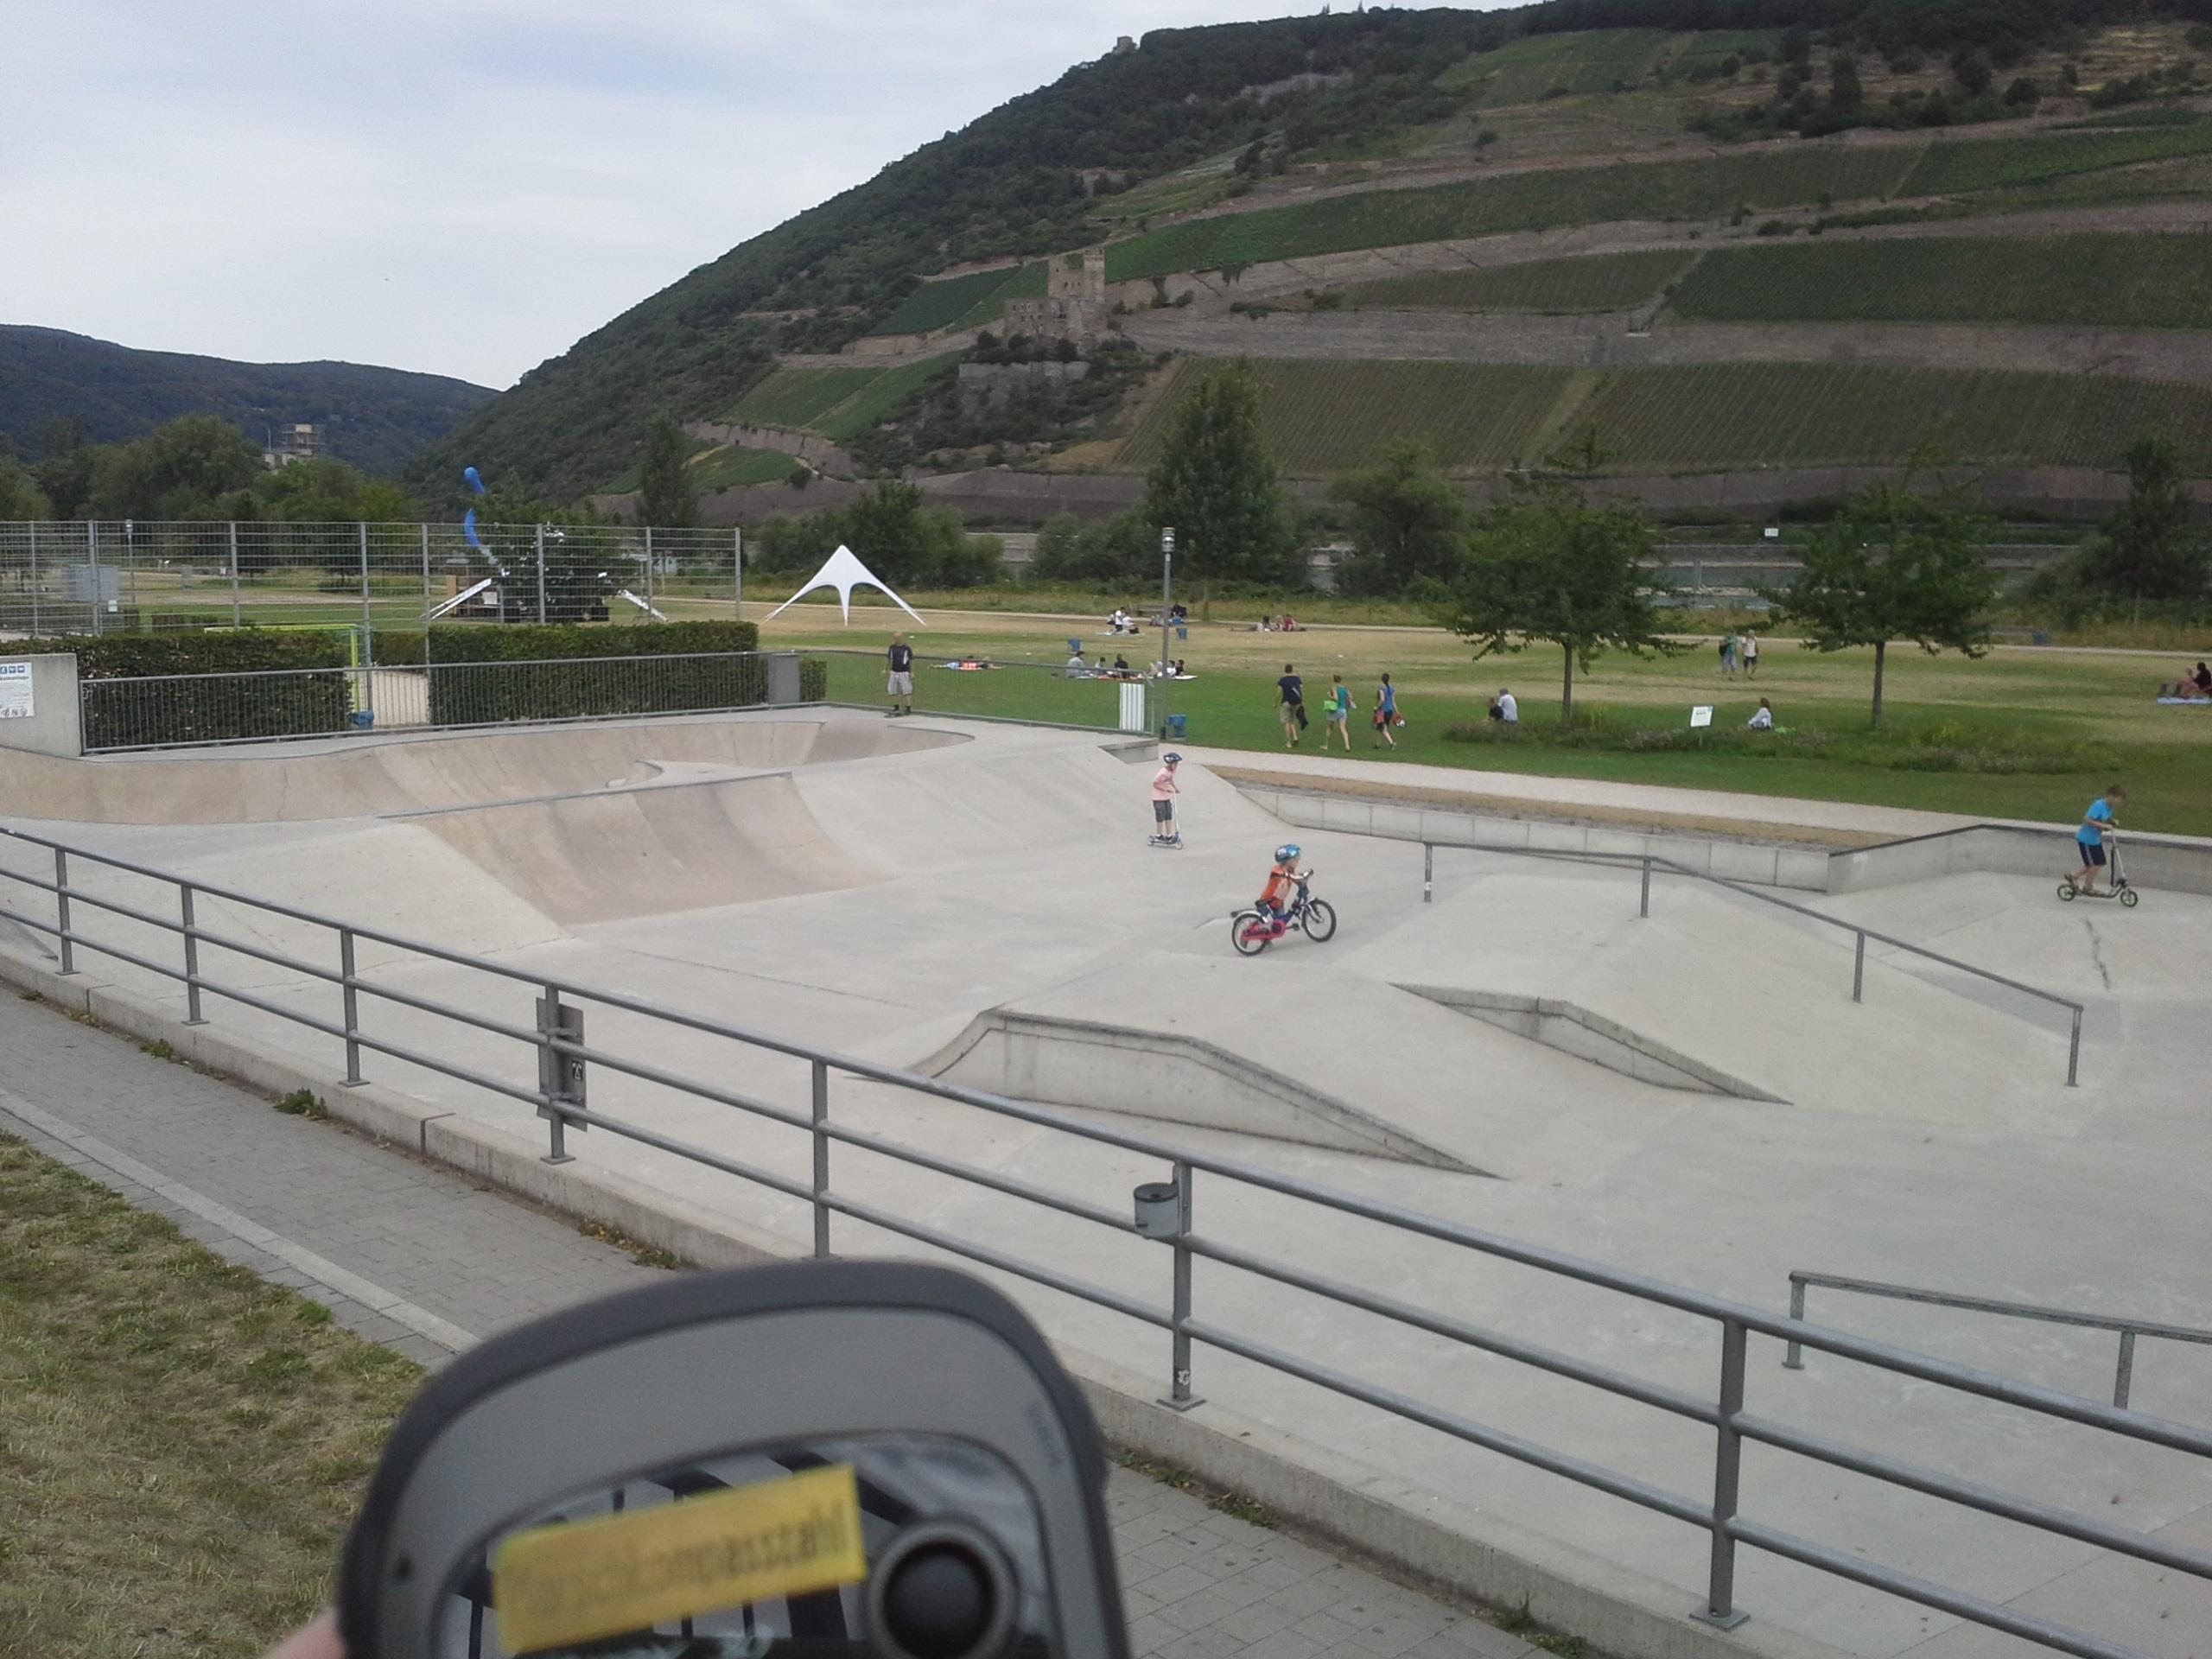 Skateanlage BIN 1